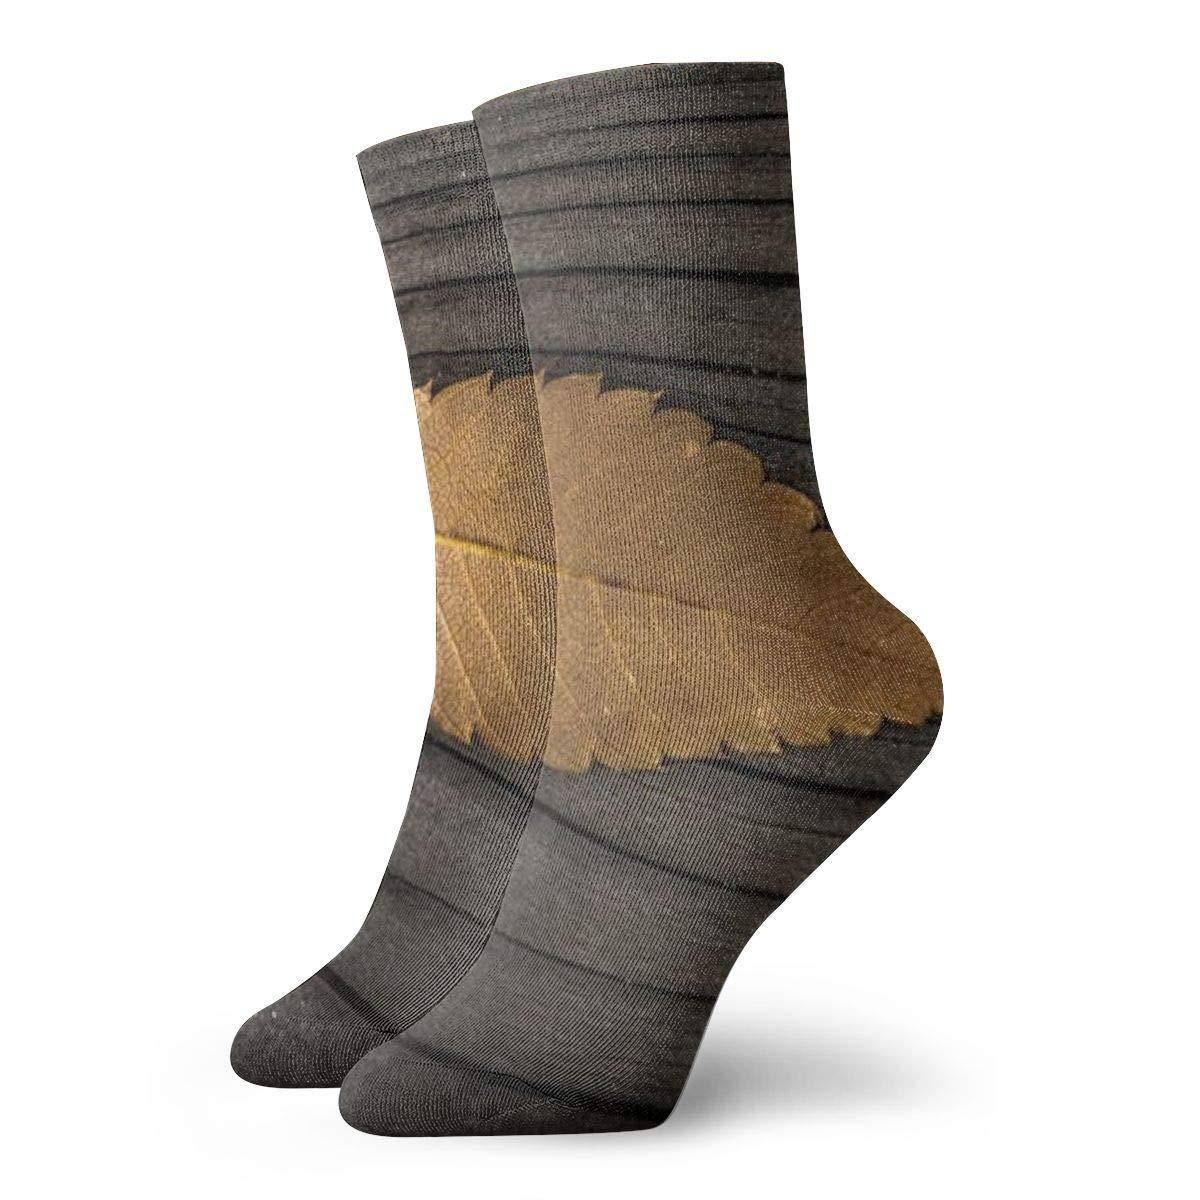 Leaf Cotton Sports Socks?2 Packs White